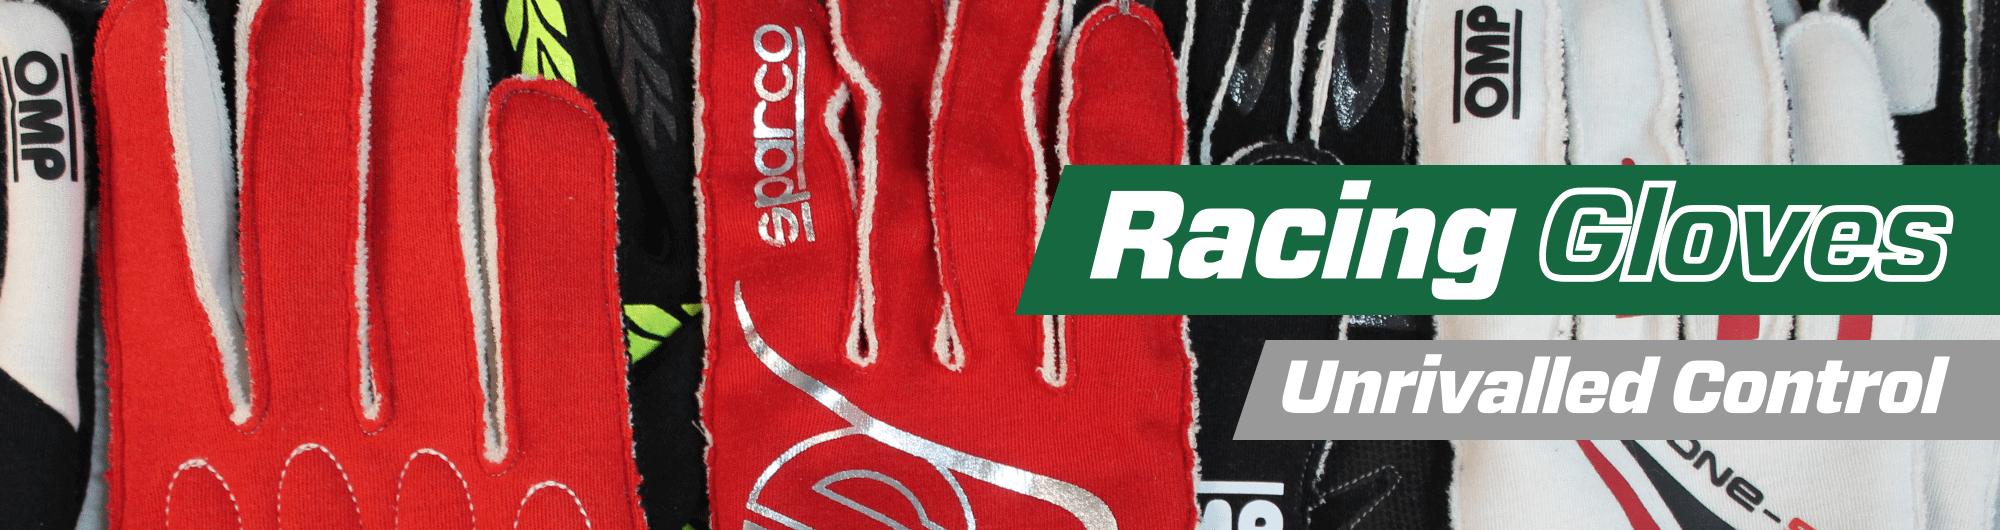 Racing Gloves – Unrivalled Control – www.gsmotorsport.co.uk Hero Image – October 2017